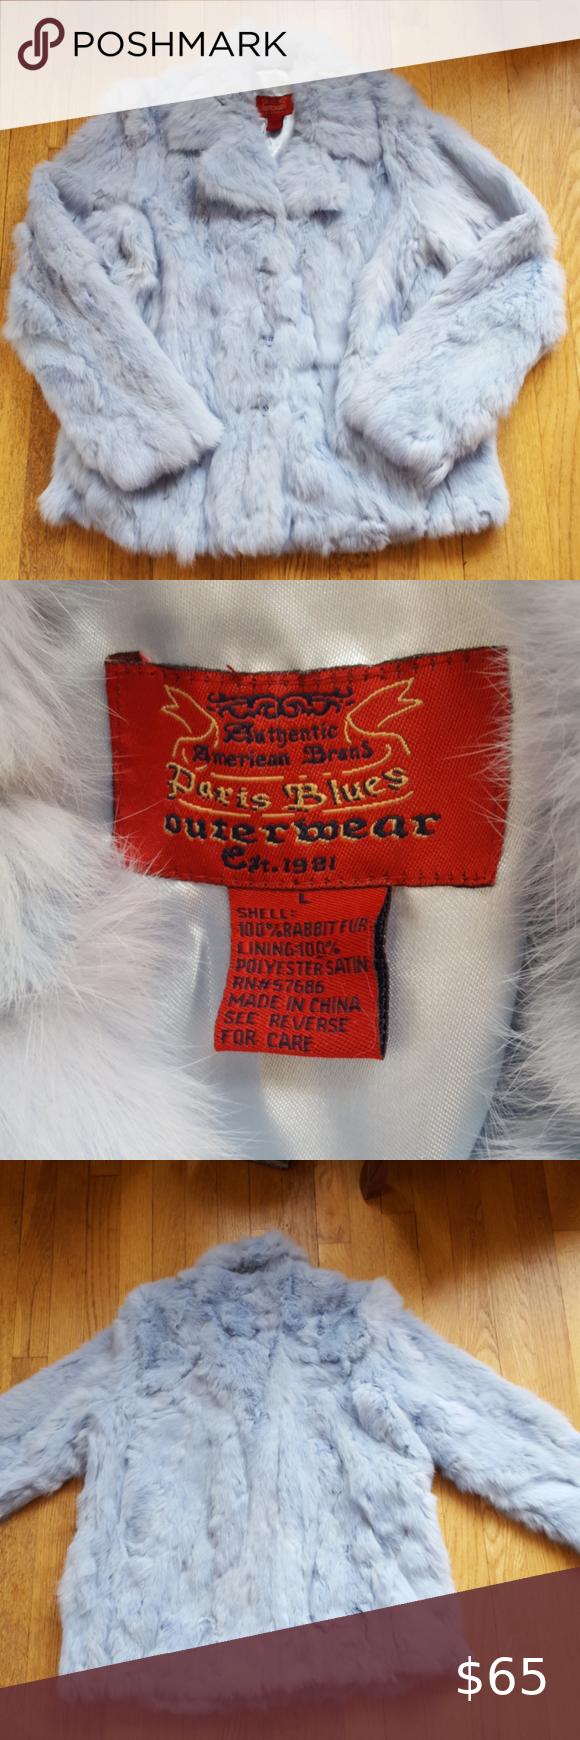 I Just Added This Listing On Poshmark Vintage Paris Blues Rabbit Fur Coat Shopmycloset Poshmark Fashion Fur Coat Vintage Denim Coat Jacket Blue Outerwear [ 1740 x 580 Pixel ]